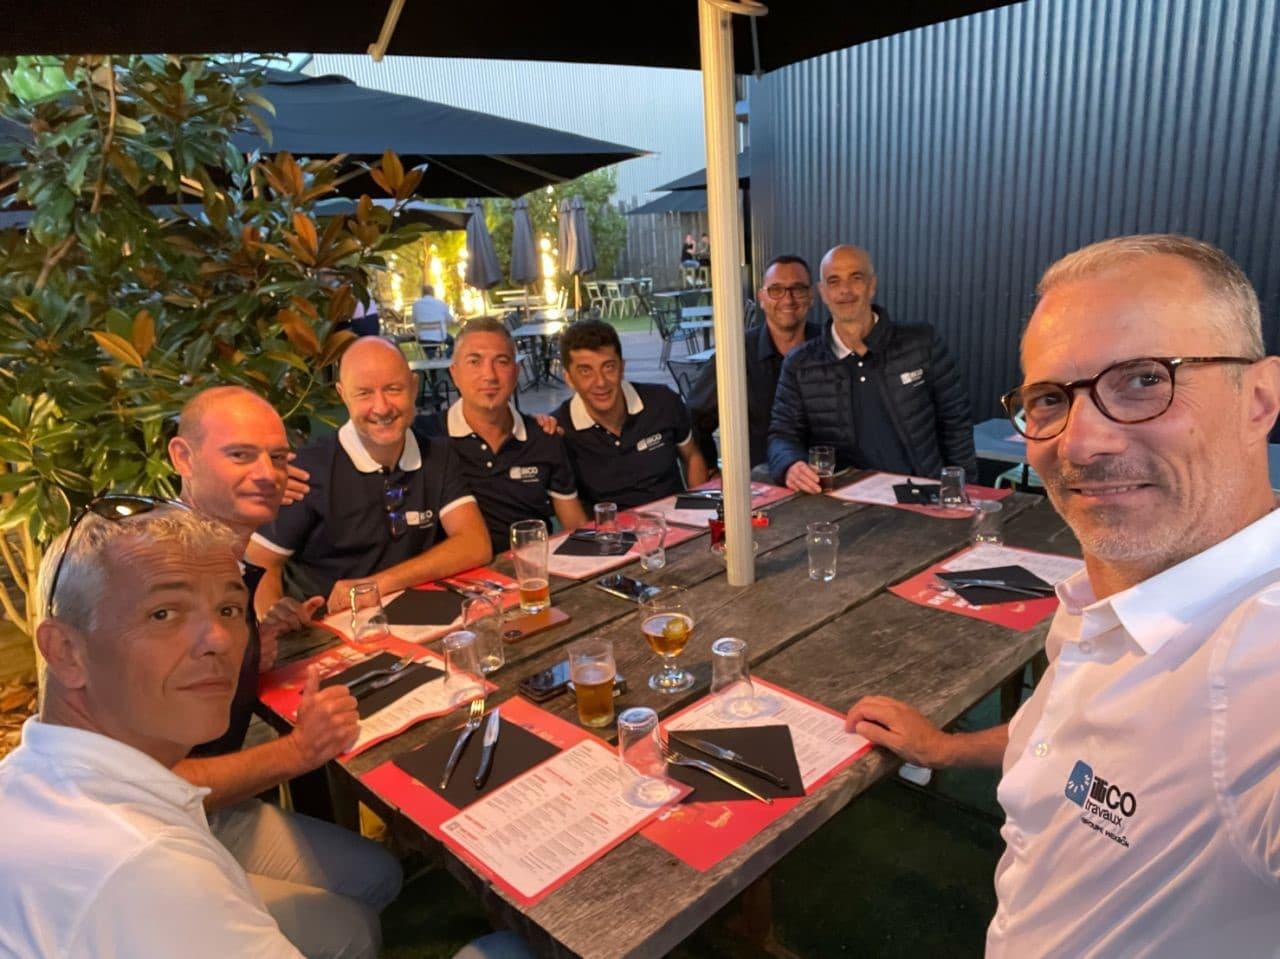 session formation initiale illiCO travaux - dîner